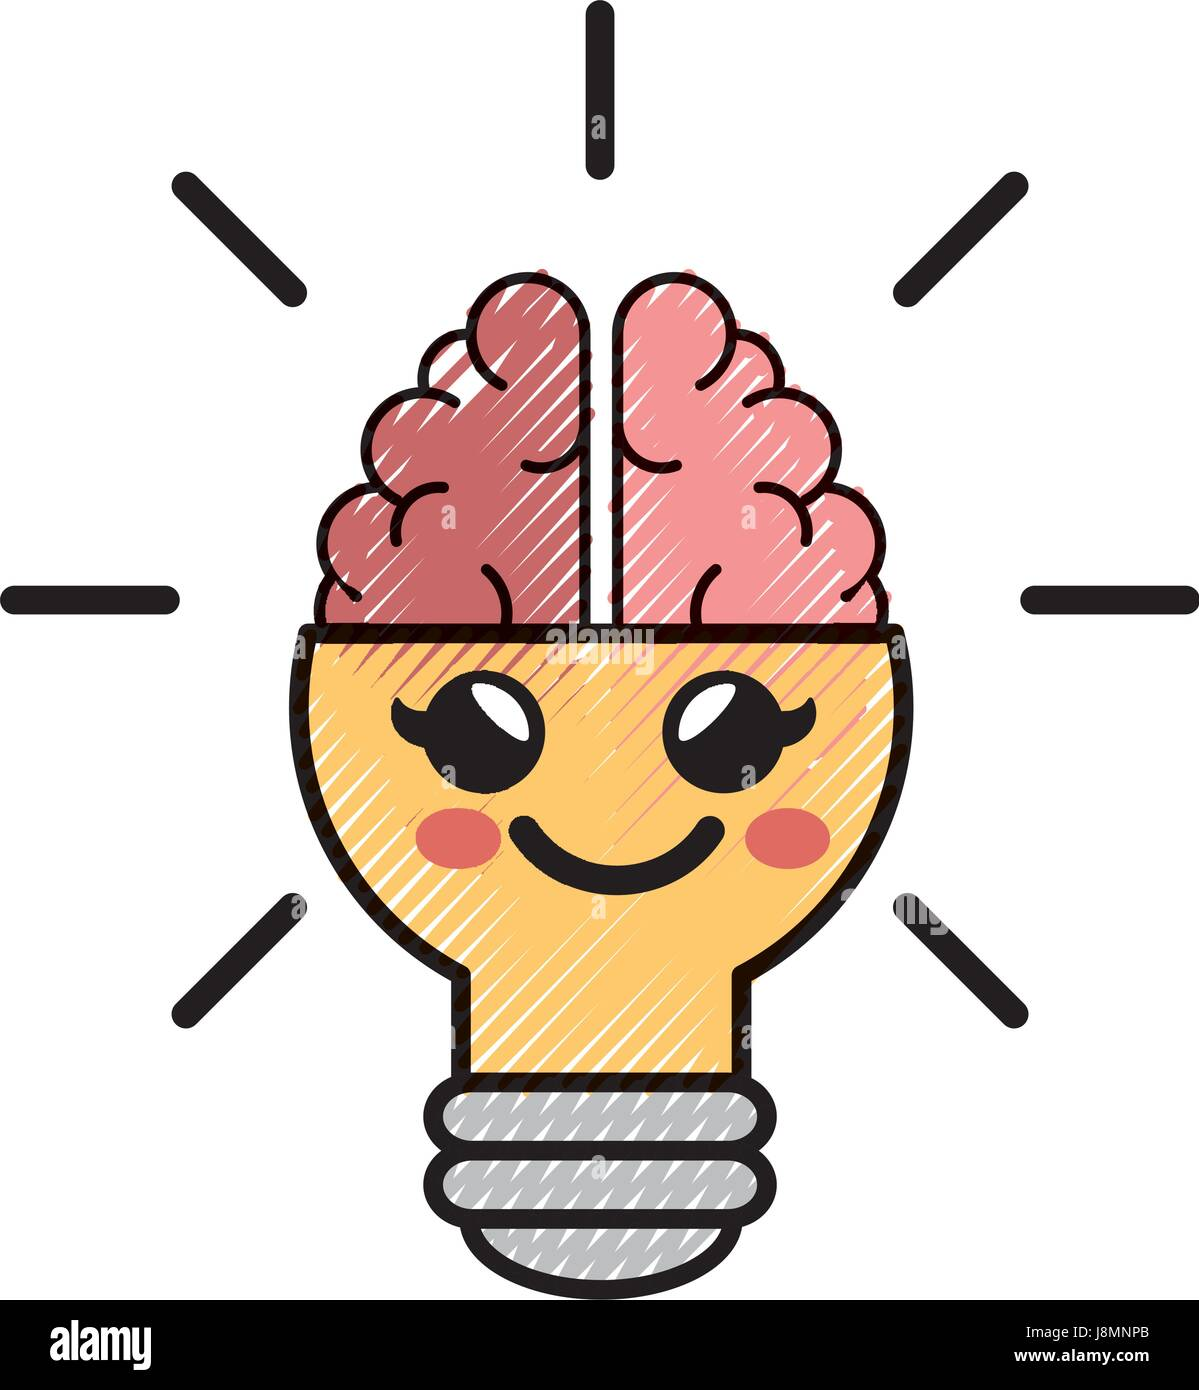 Ampoule Lumiere Idee Dessin Anime Image Vectorielle Stock Alamy